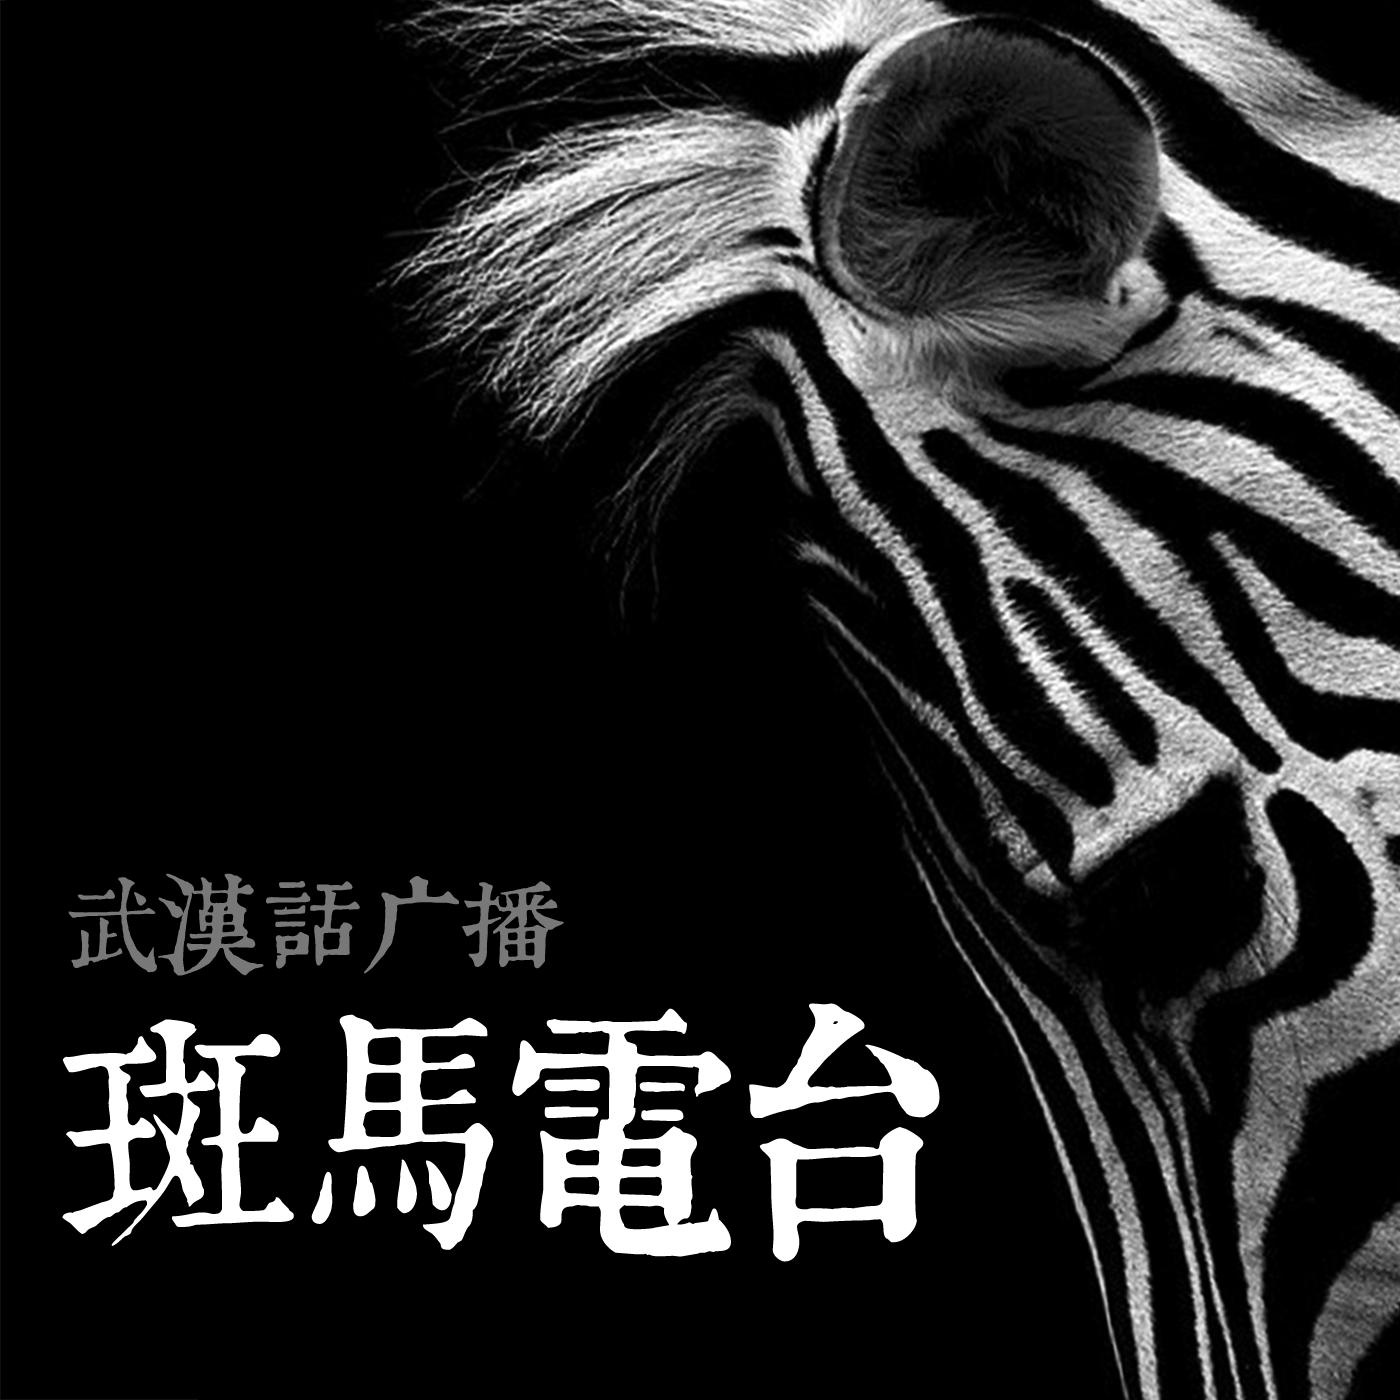 <![CDATA[斑马电台 - 武汉话播客]]>